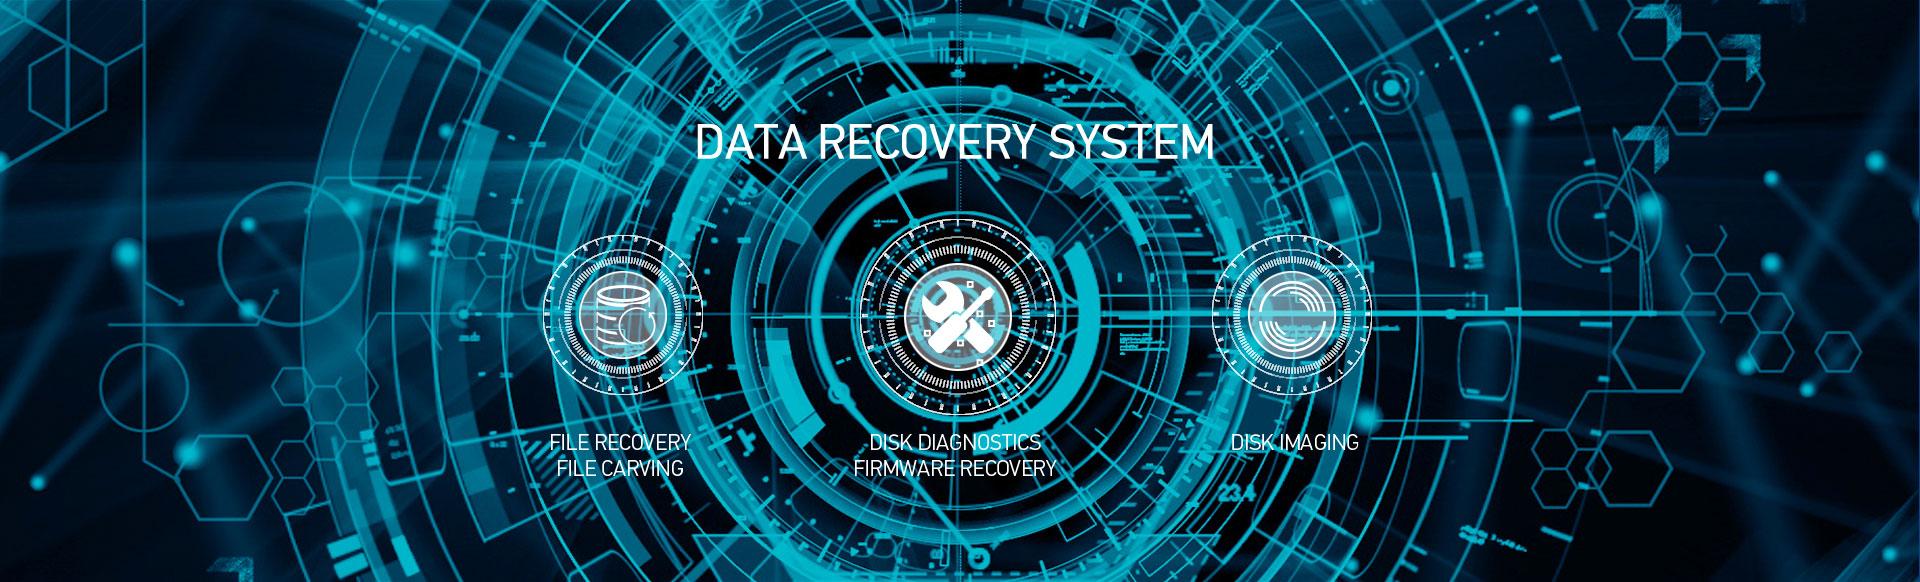 Data Storage Systems